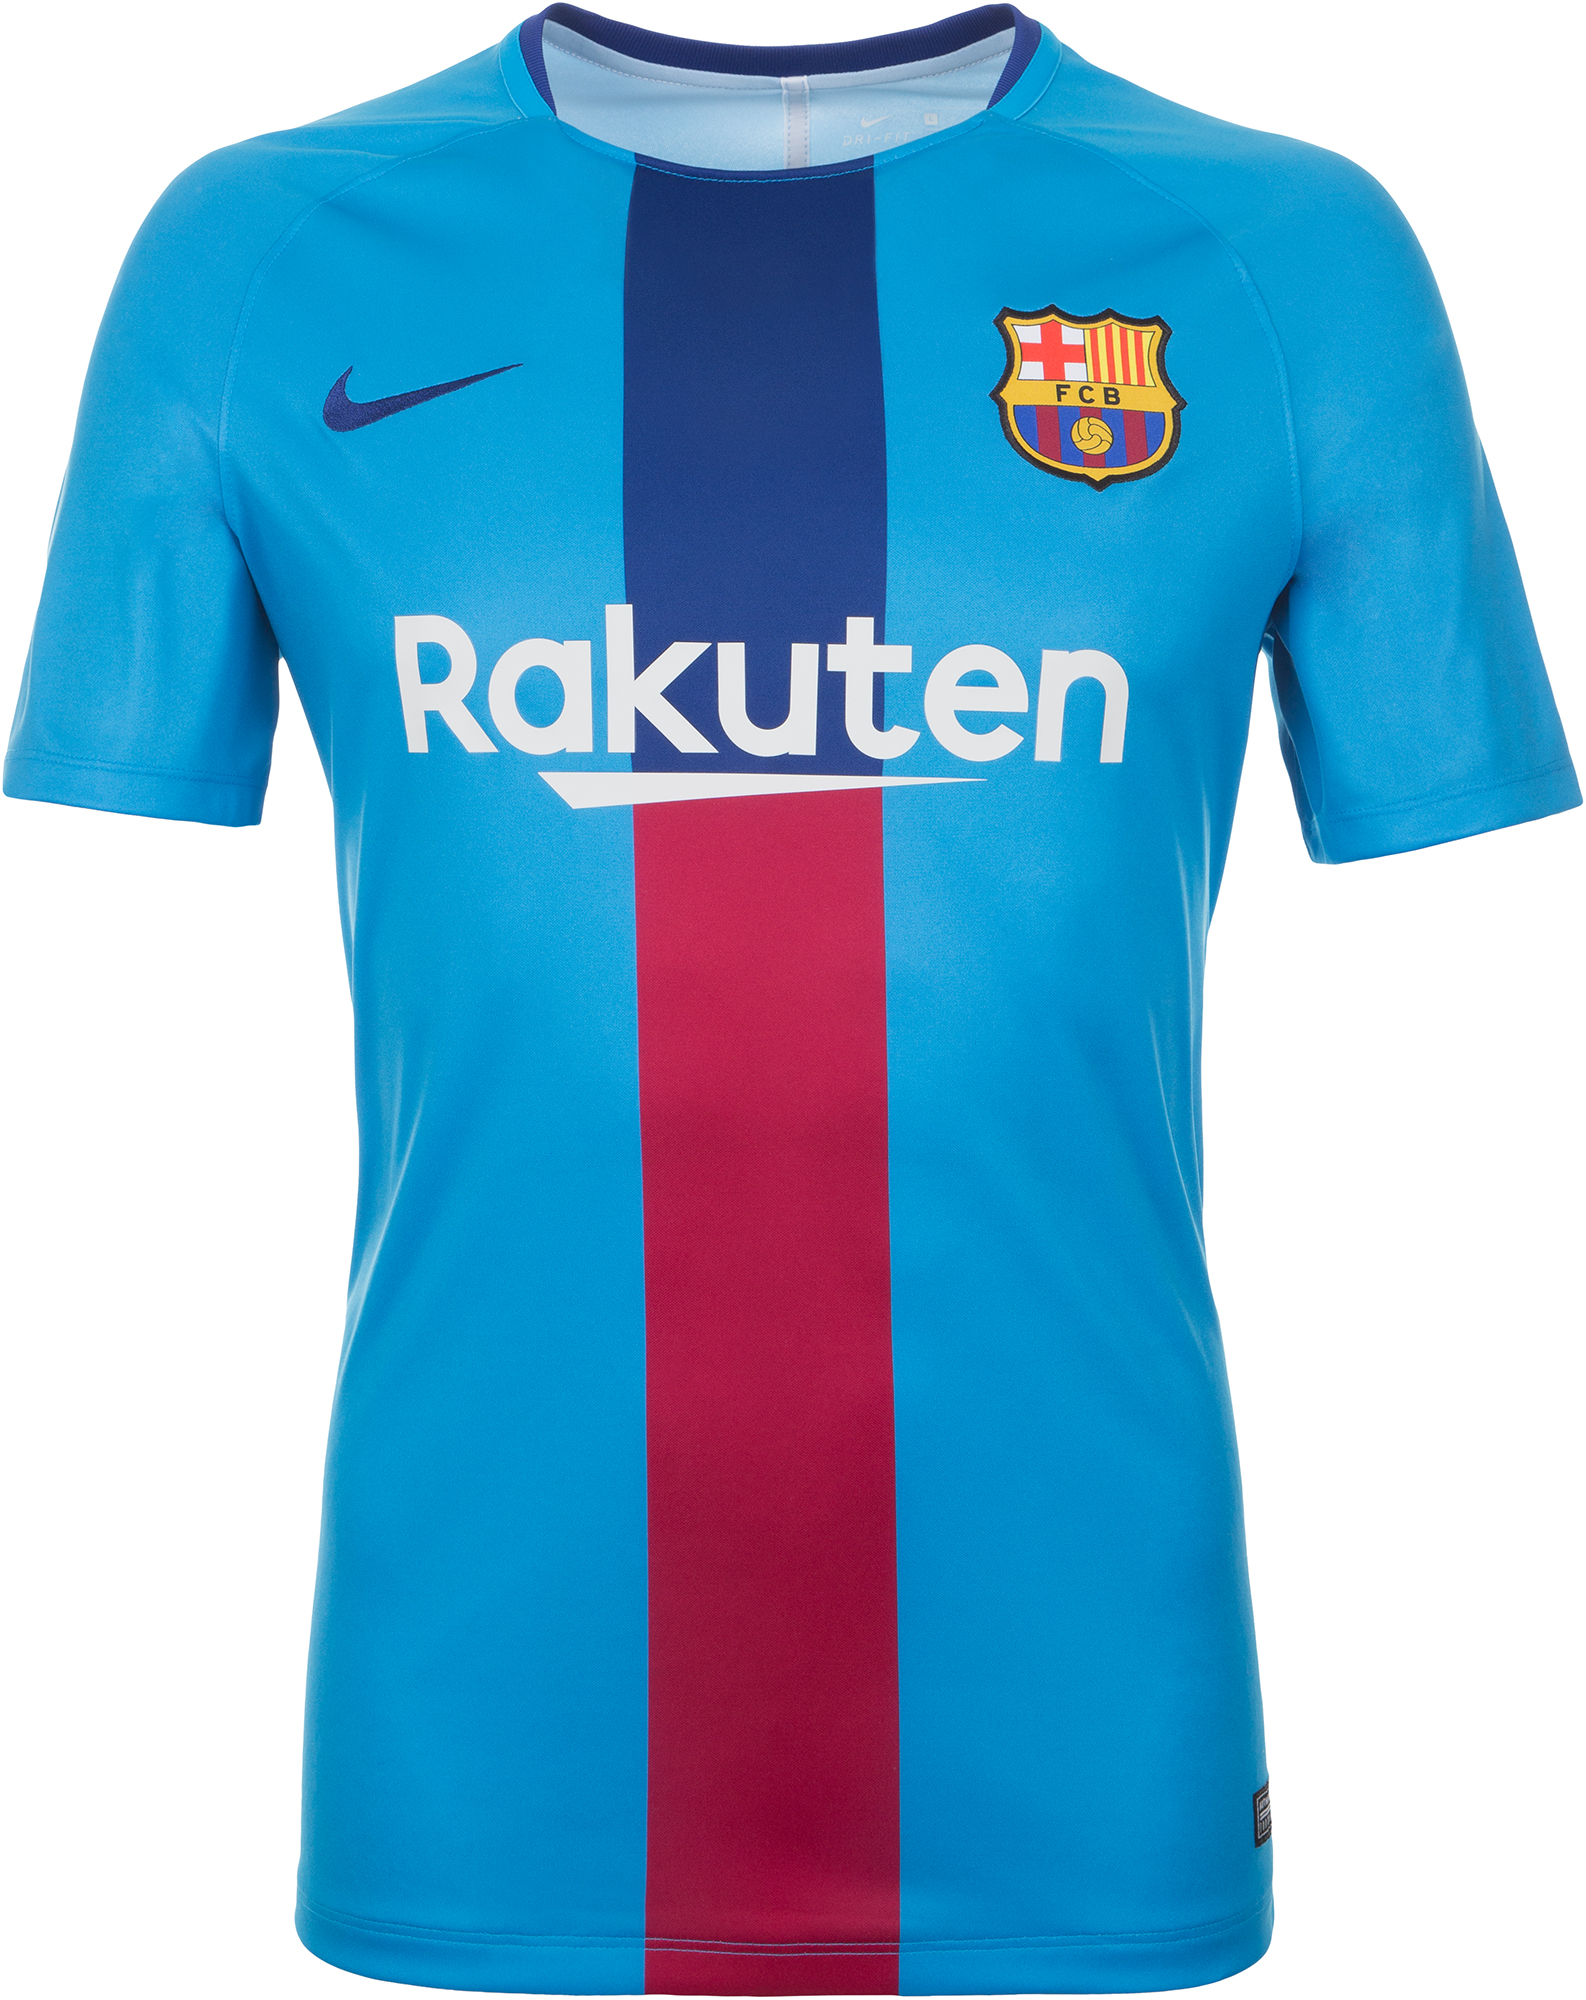 Nike Футболка мужская Nike Dry FC Barcelona, размер 52-54 цена 2017